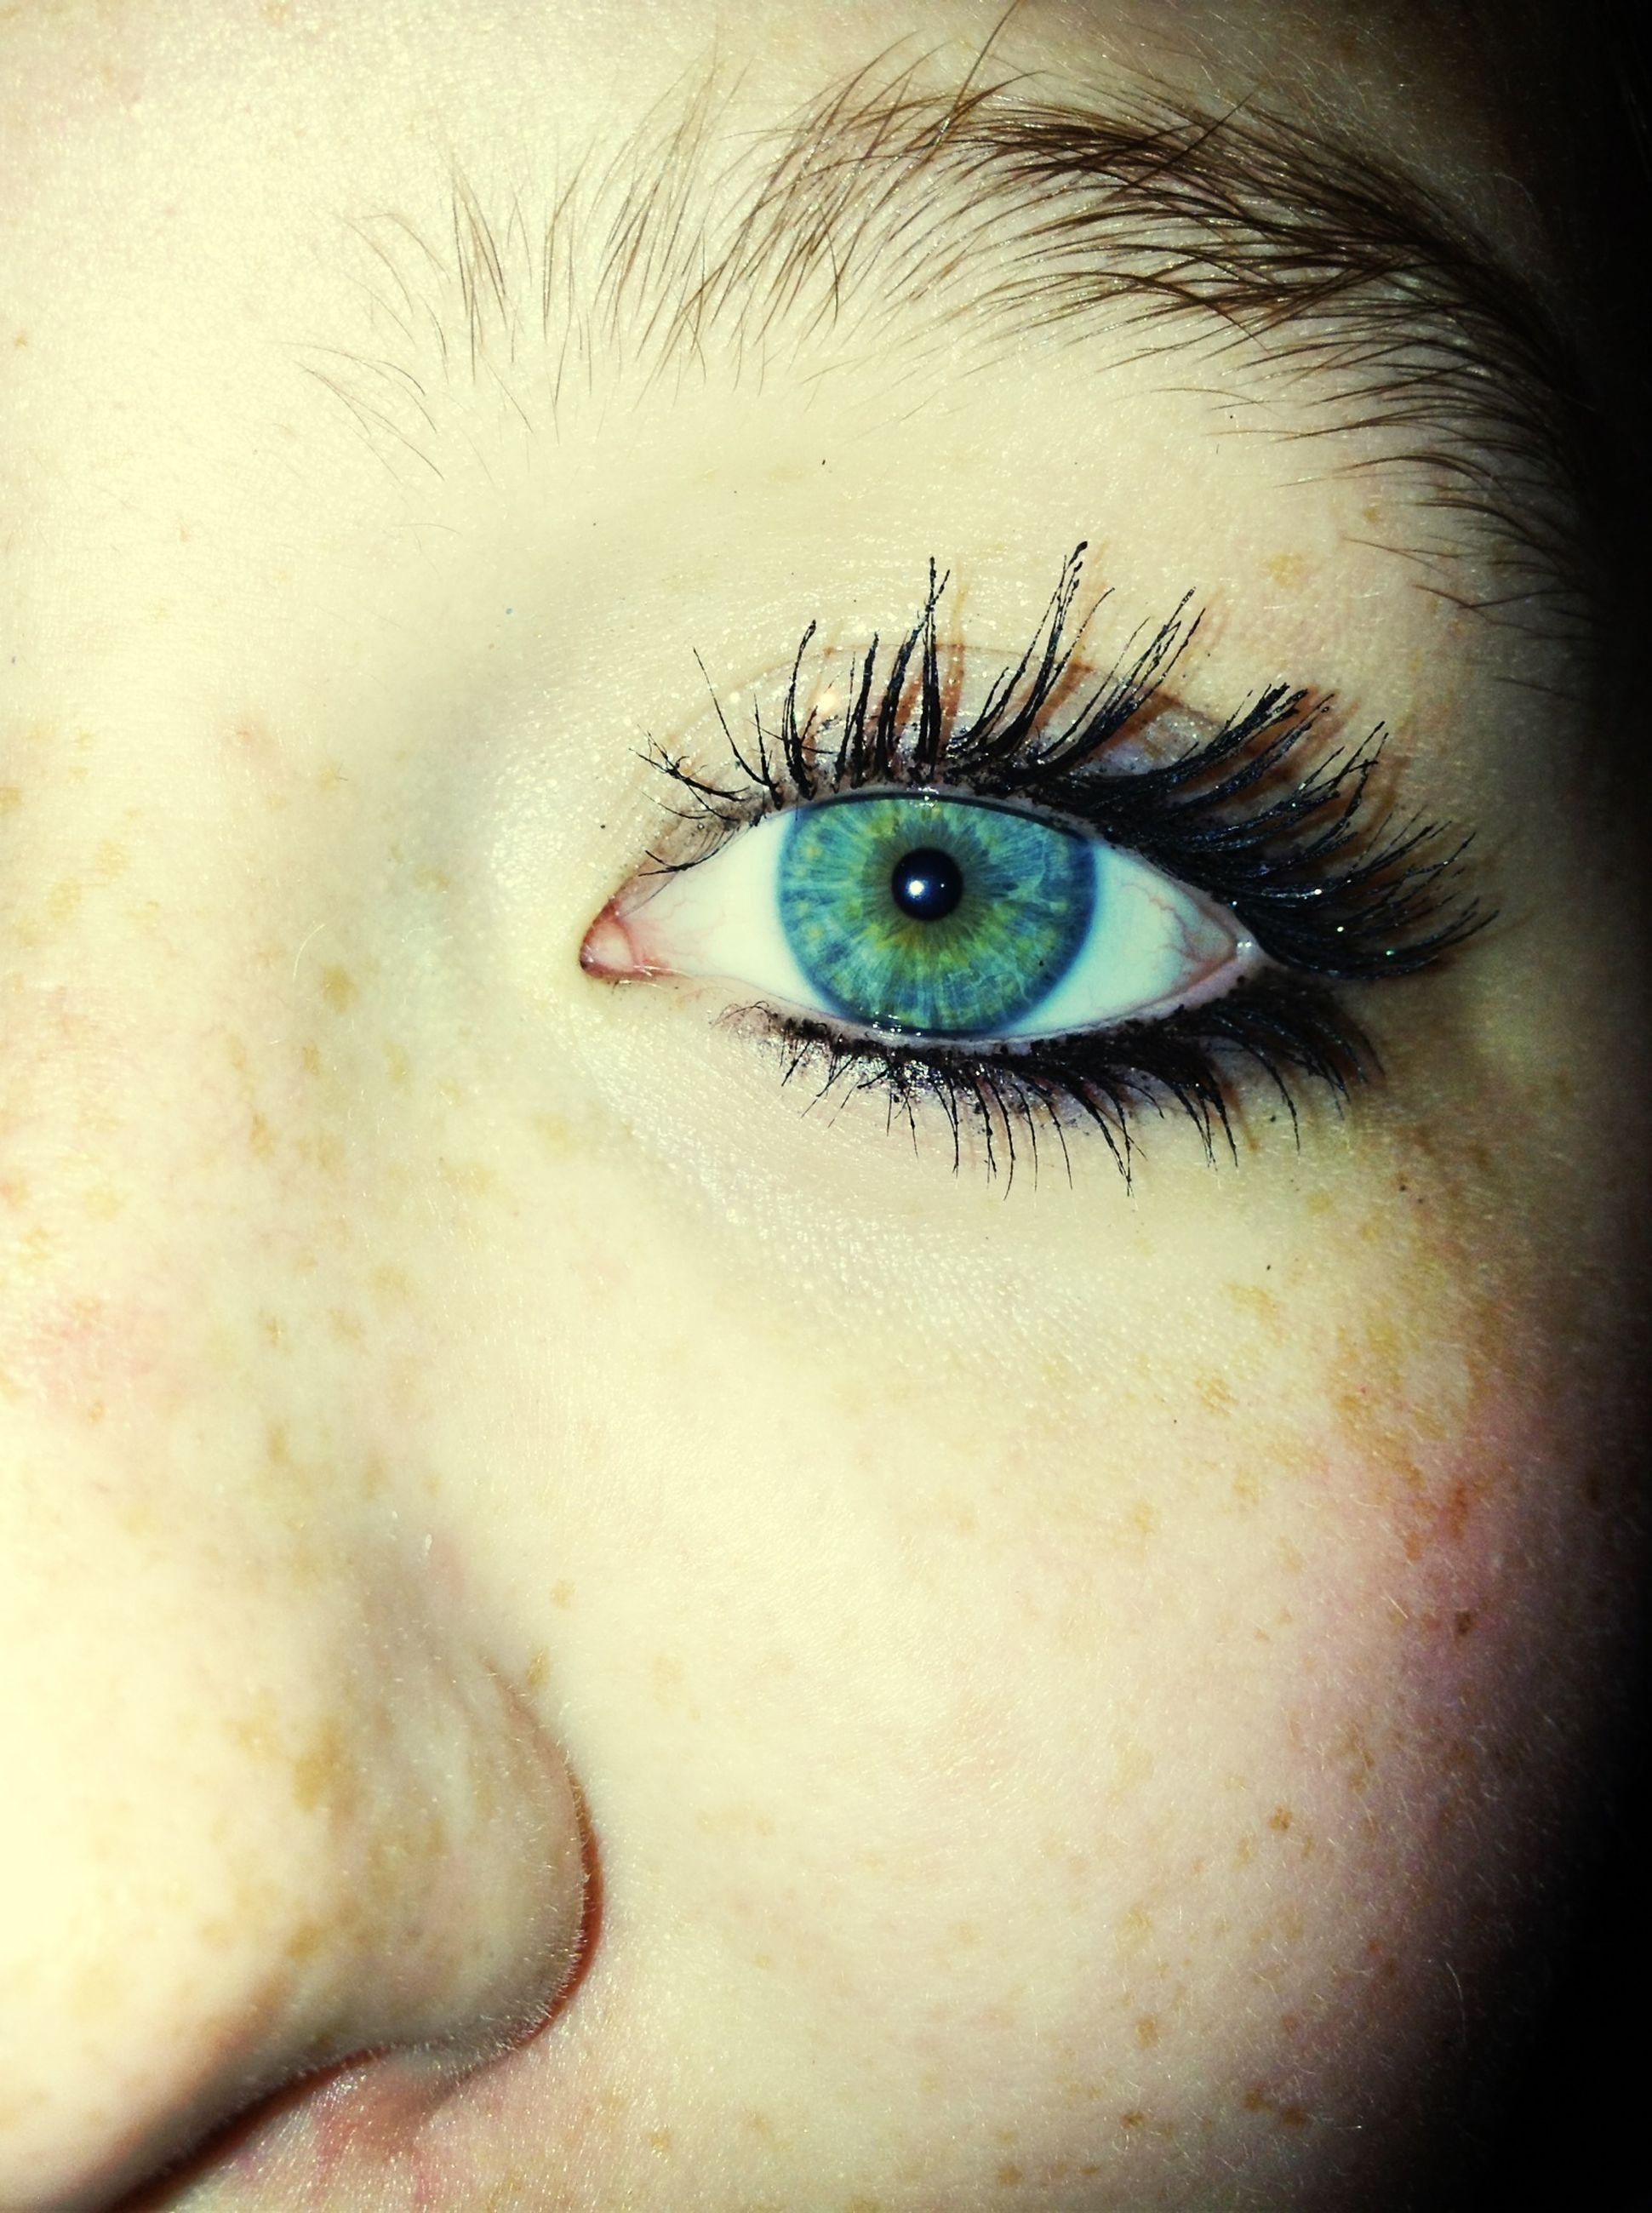 close-up, human eye, eyesight, sensory perception, eyelash, indoors, part of, unrecognizable person, human skin, portrait, eyeball, one animal, studio shot, looking at camera, extreme close-up, iris - eye, high angle view